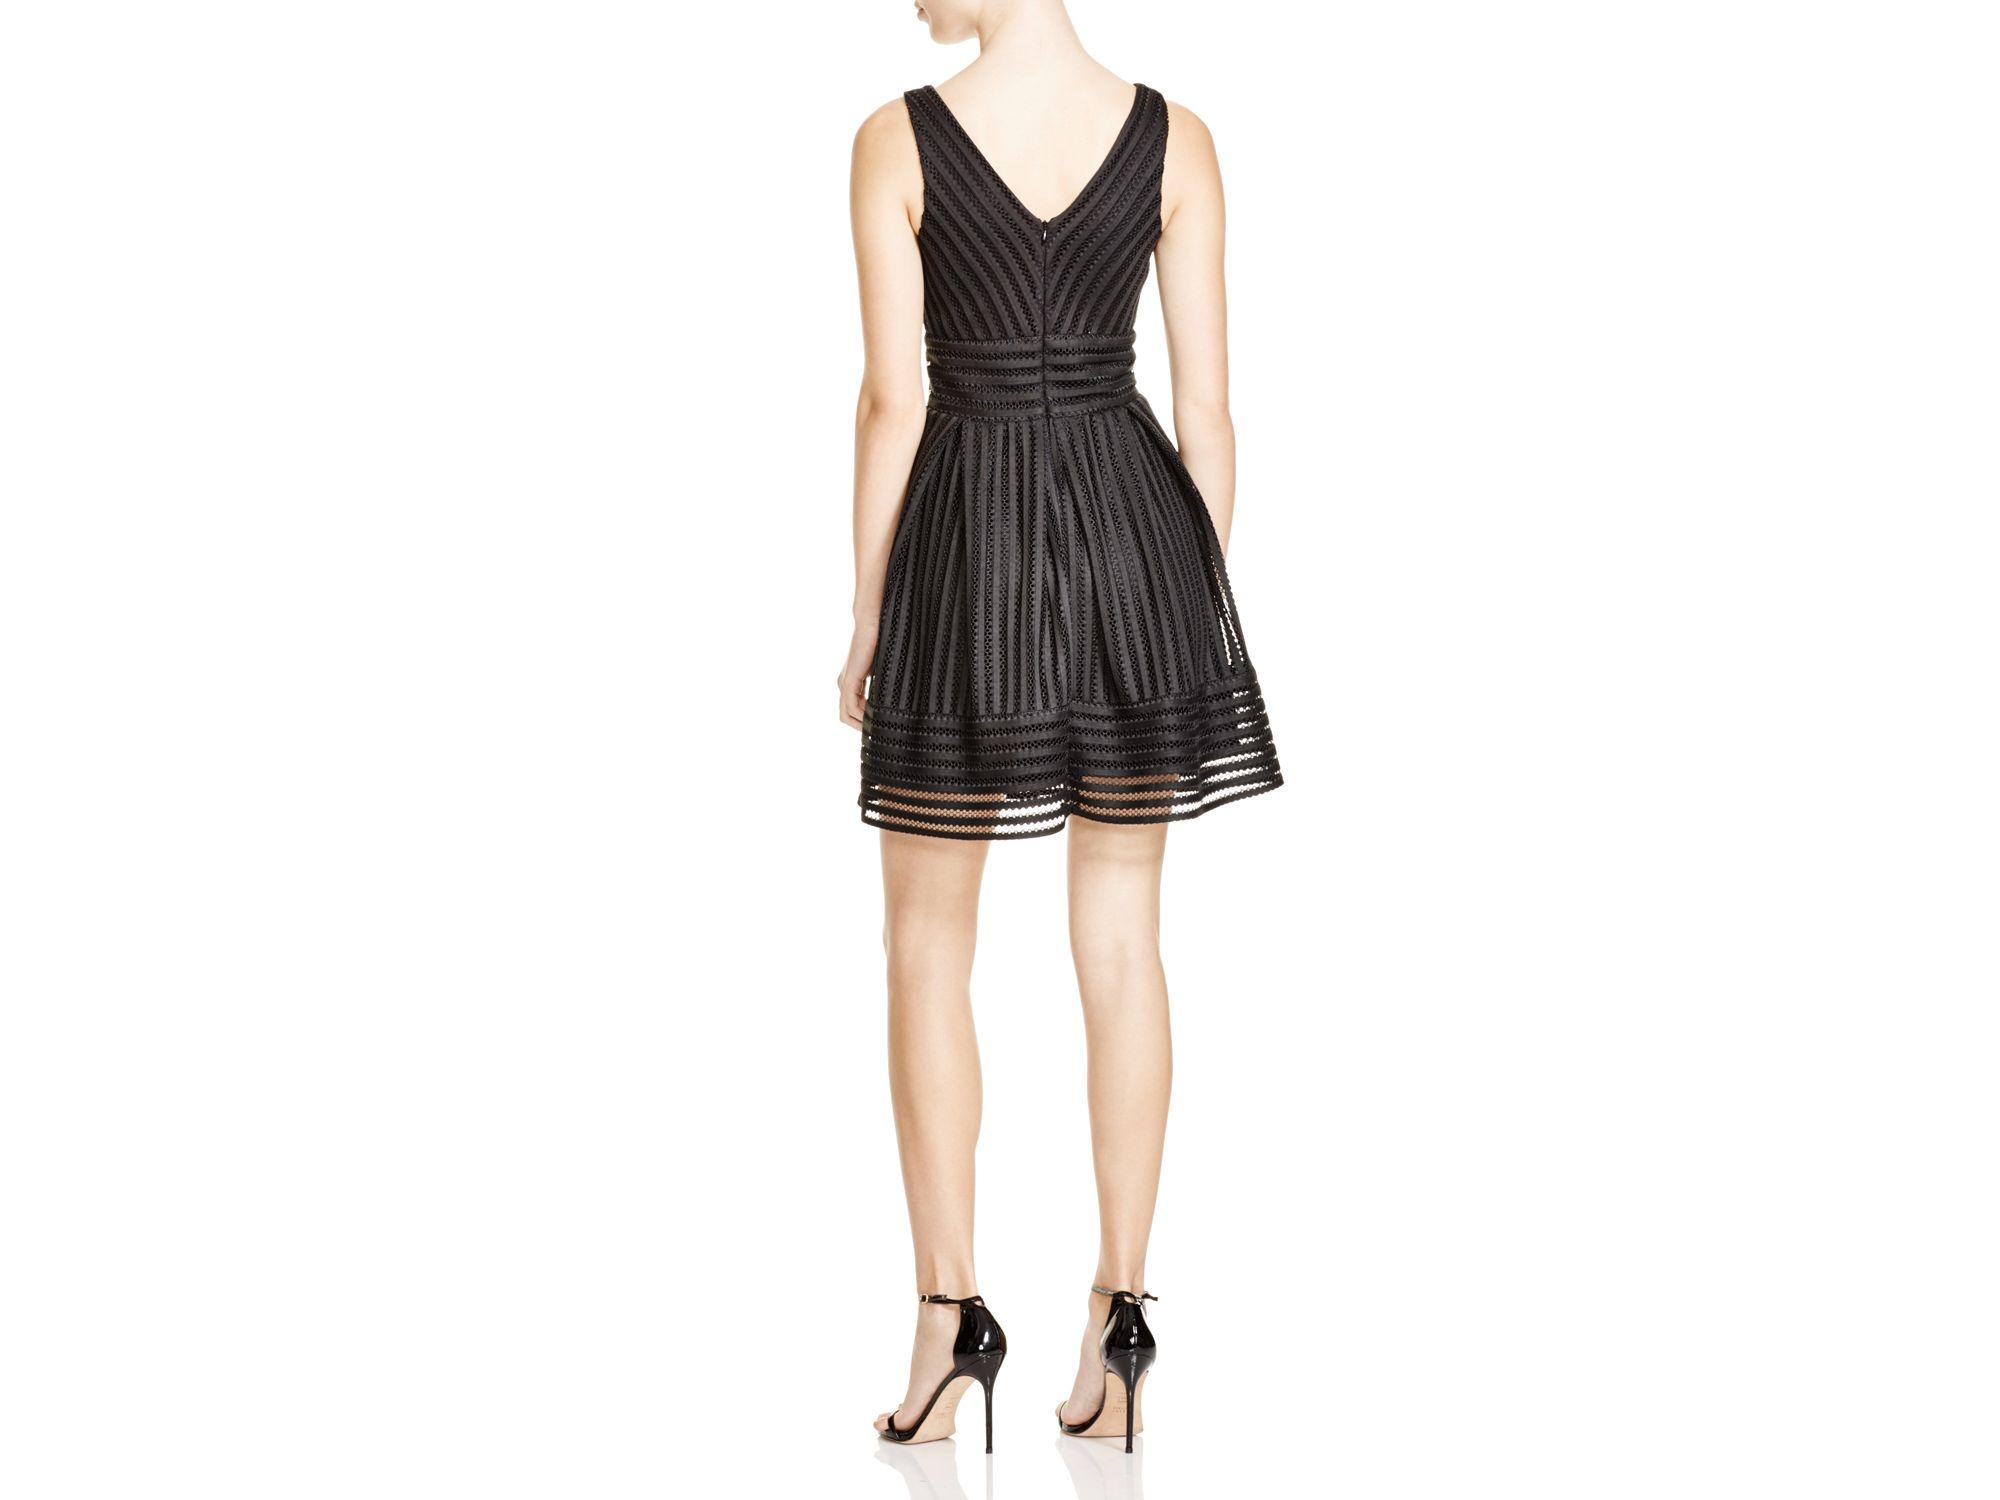 794eb89fb89 Aqua Mesh Neoprene Stripe Dress in Black - Lyst